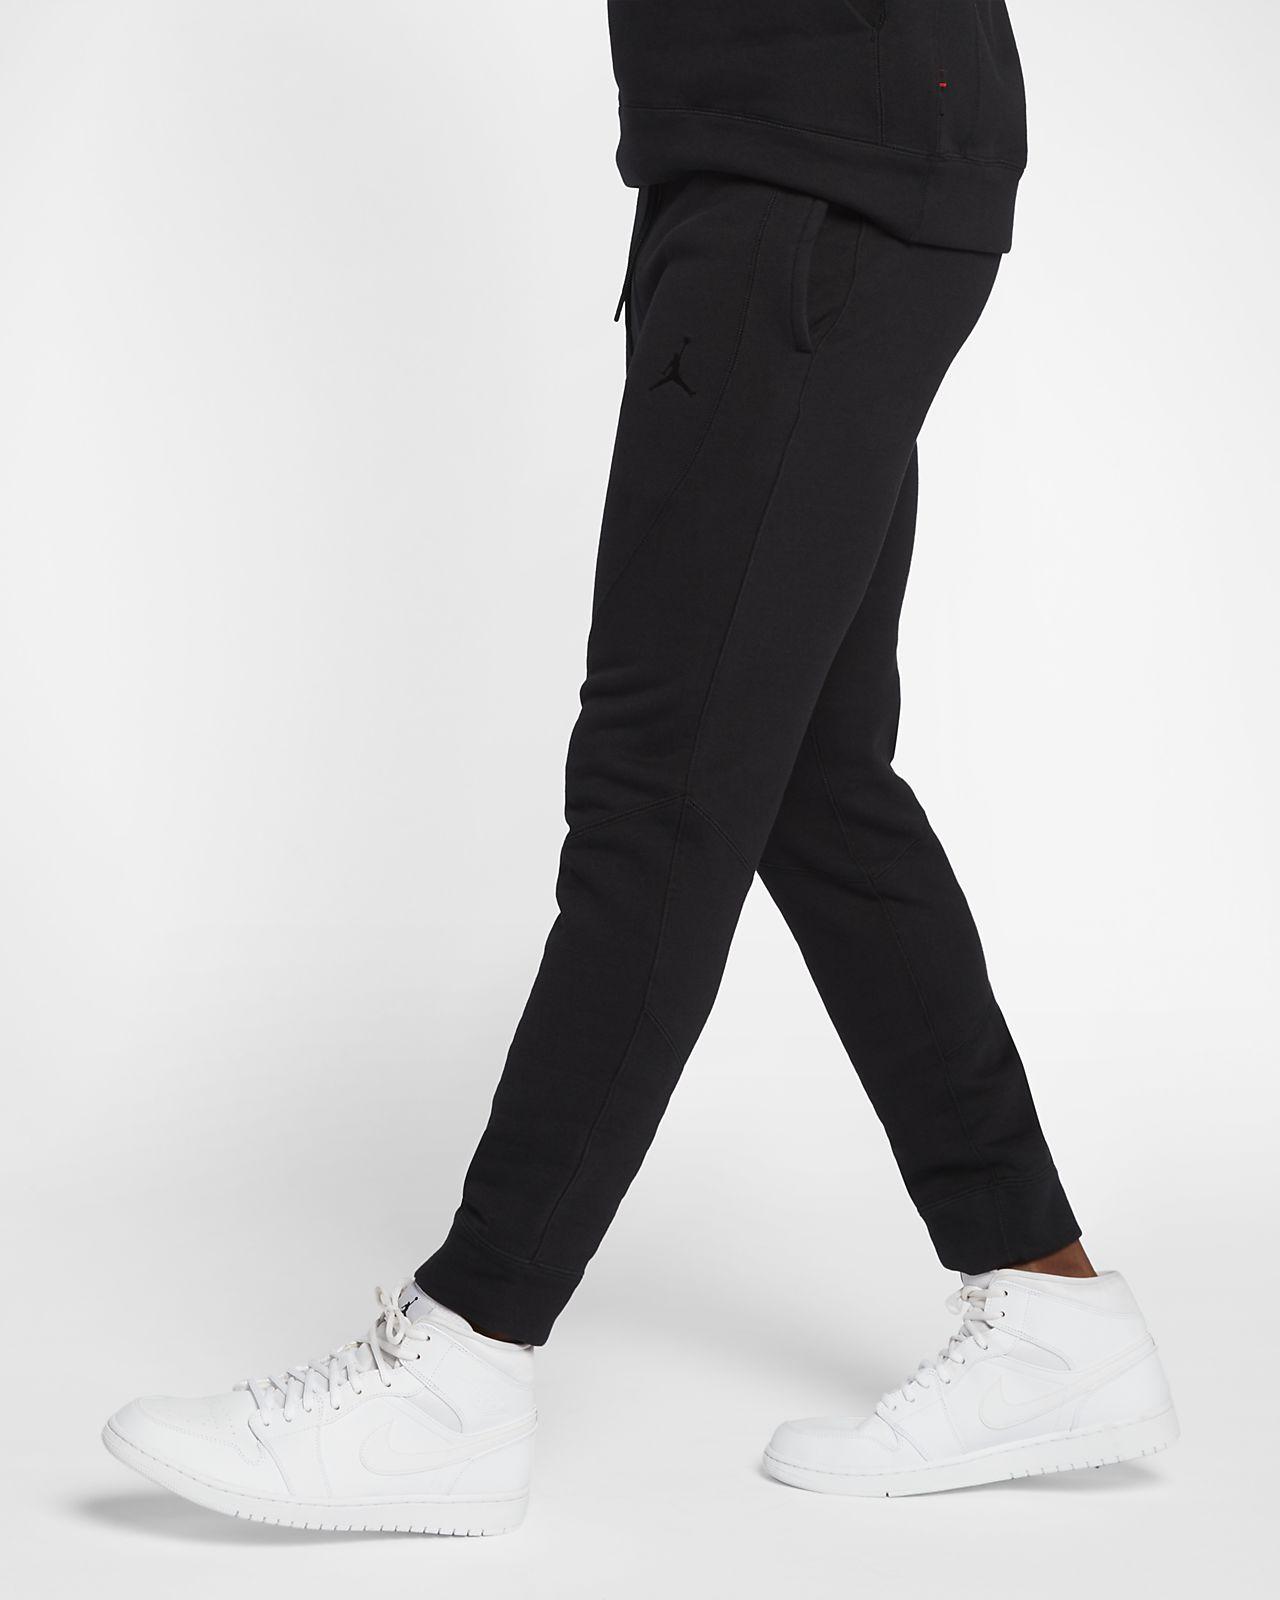 Мужские флисовые брюки Jordan Sportswear Wings. Nike.com RU 171b751c47a